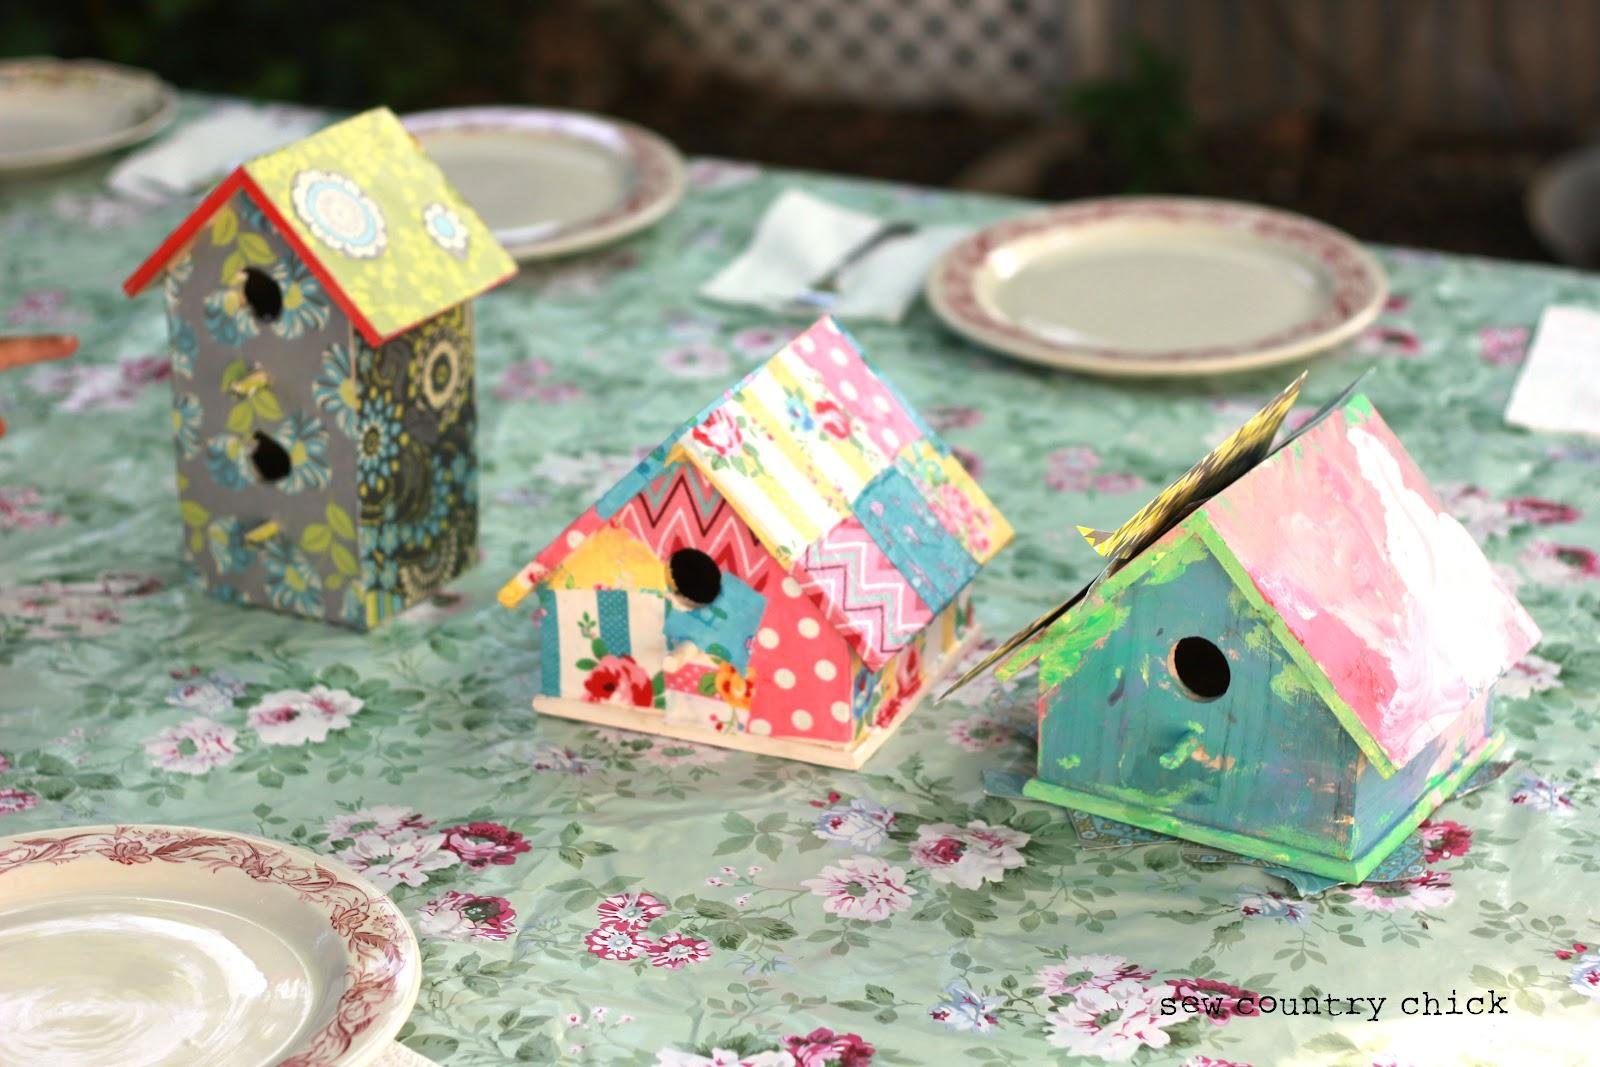 Mod Podge A Birdhouse Spring Crafts With Kids